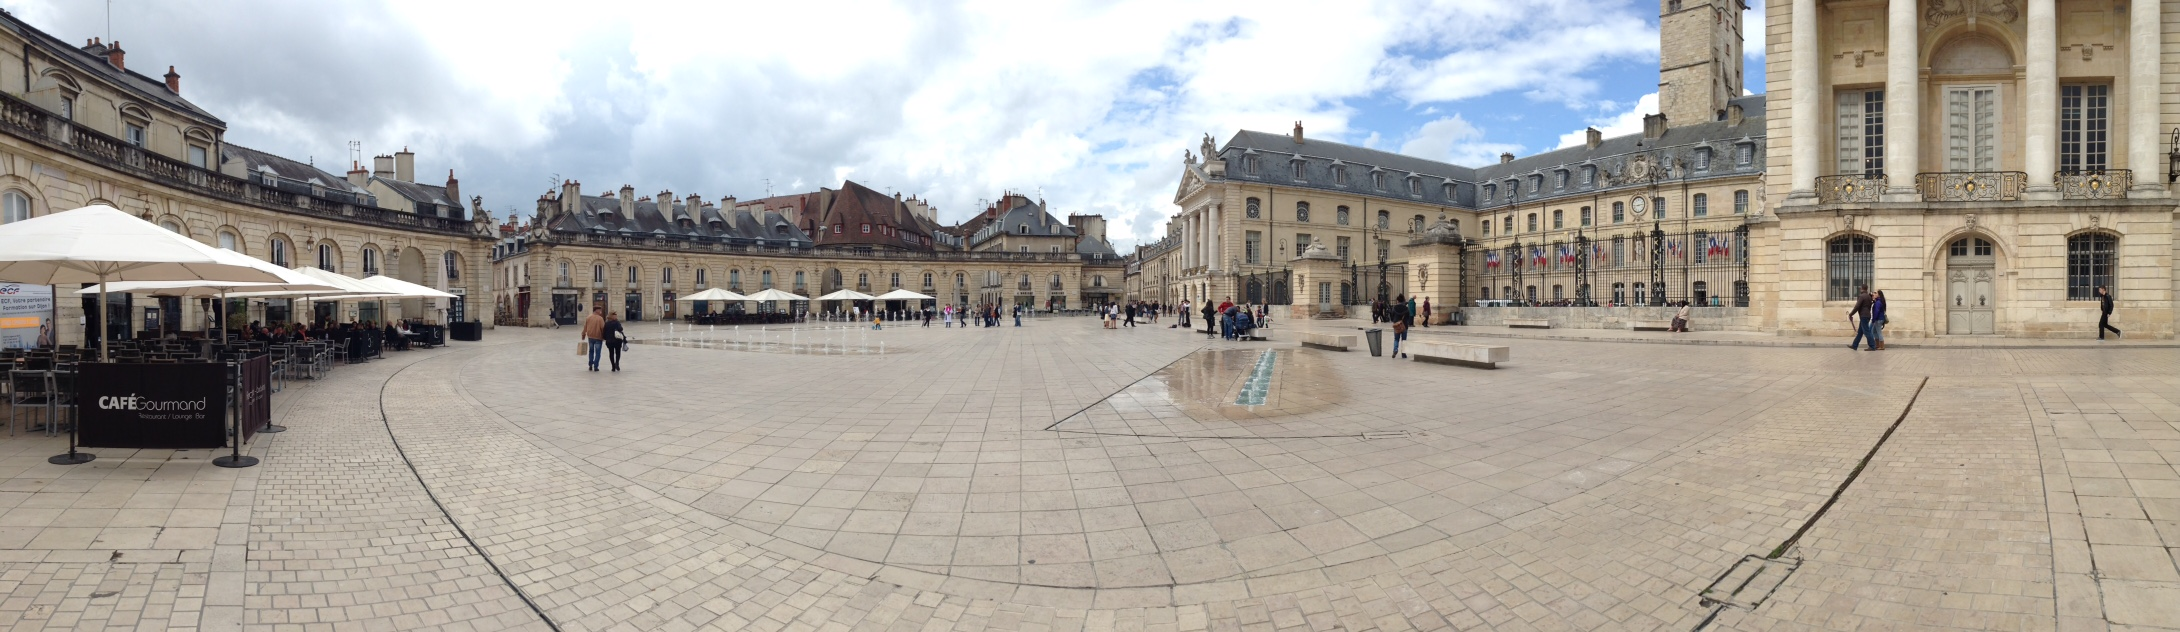 Place de la Liberation, Dijon.